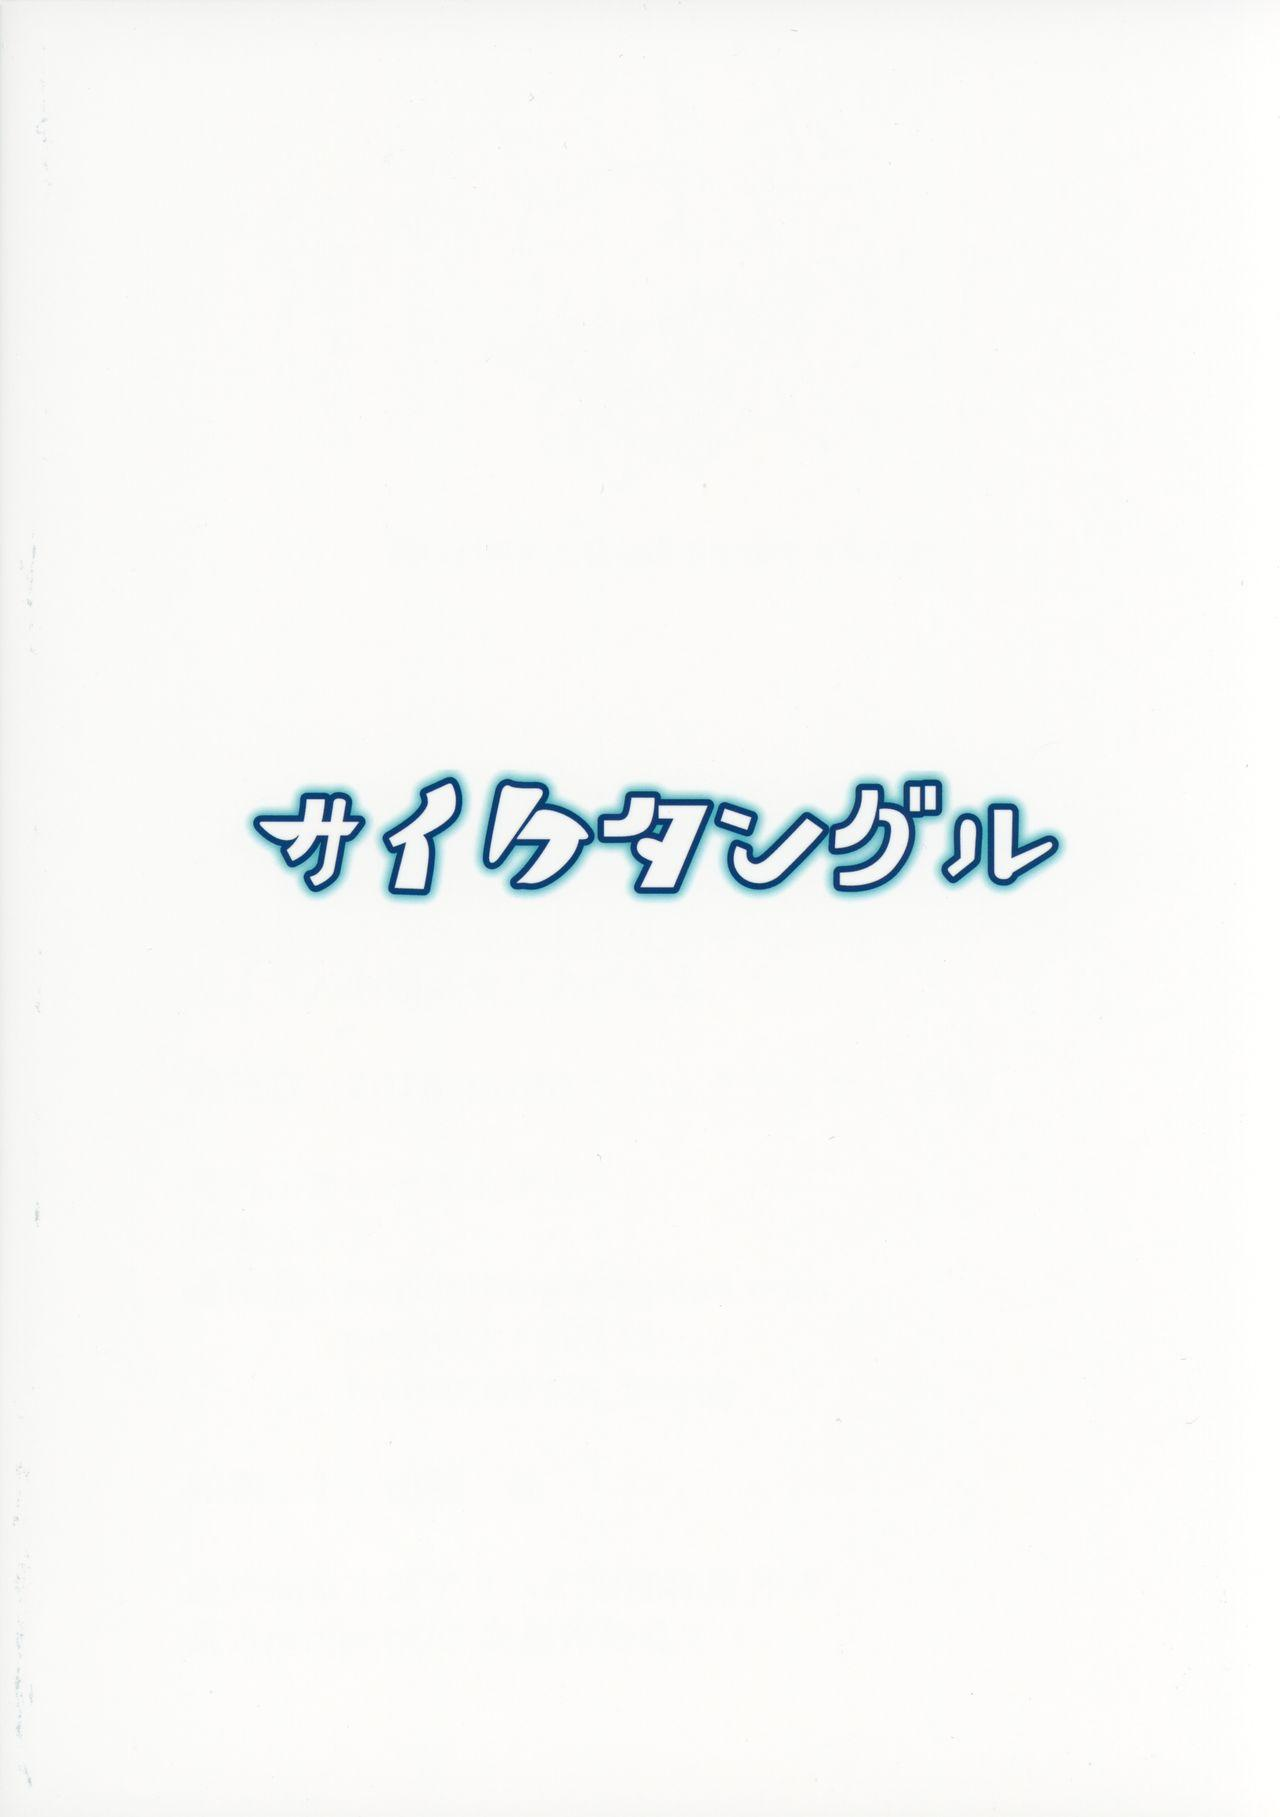 Orin-chan o Tappuri Amae Sasete Takusan Shasei Sasete Ageru Hon. 21